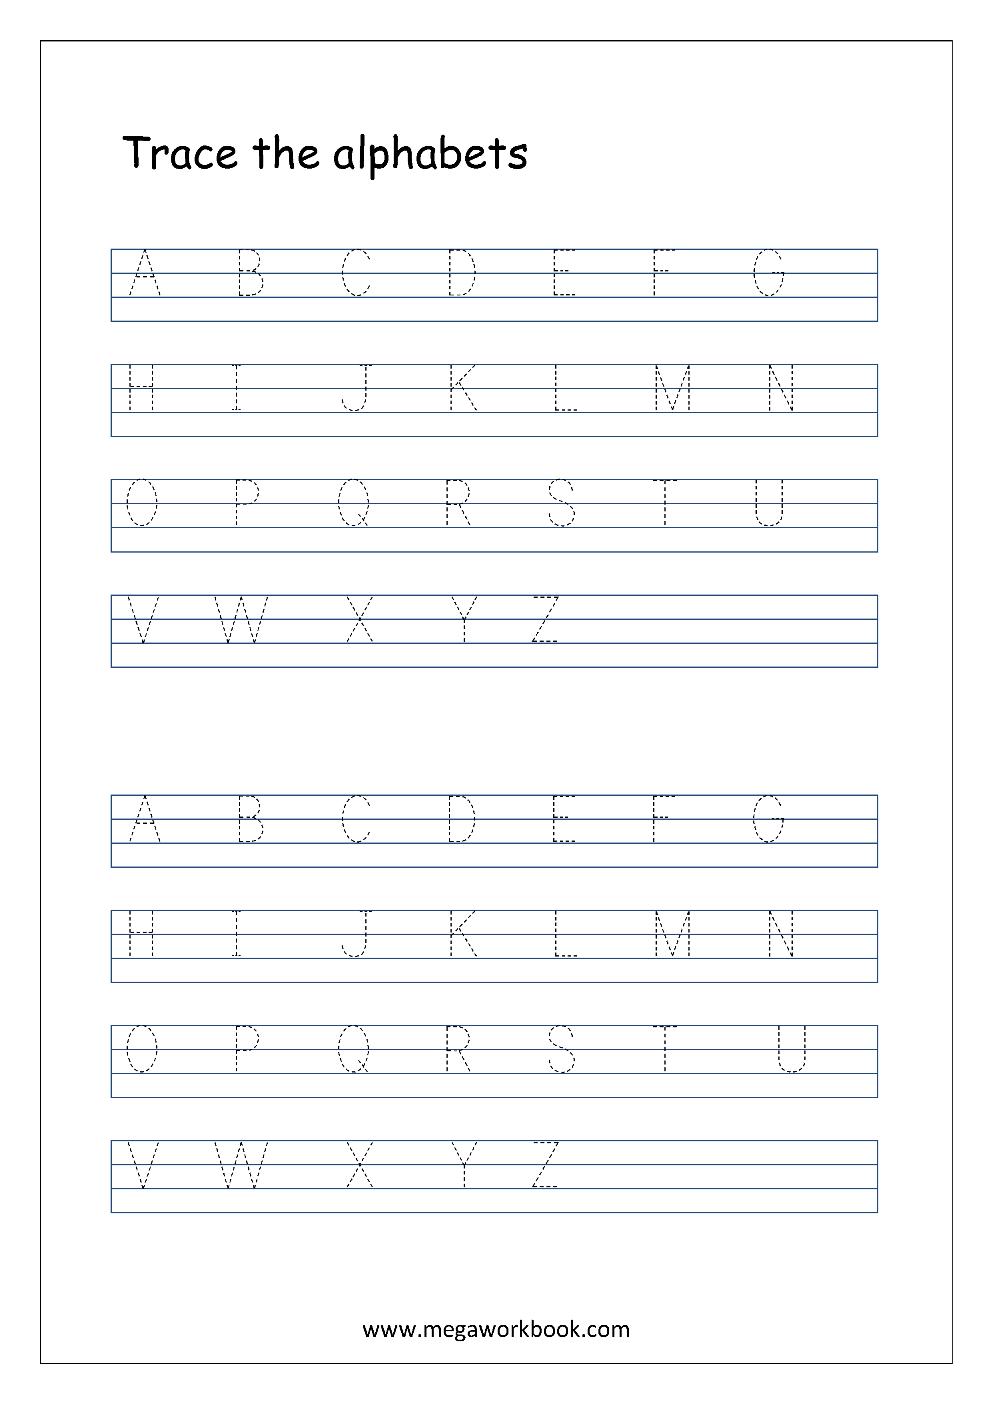 Free English Worksheets - Alphabet Tracing (Capital Letters - Free Printable Alphabet Tracing Worksheets